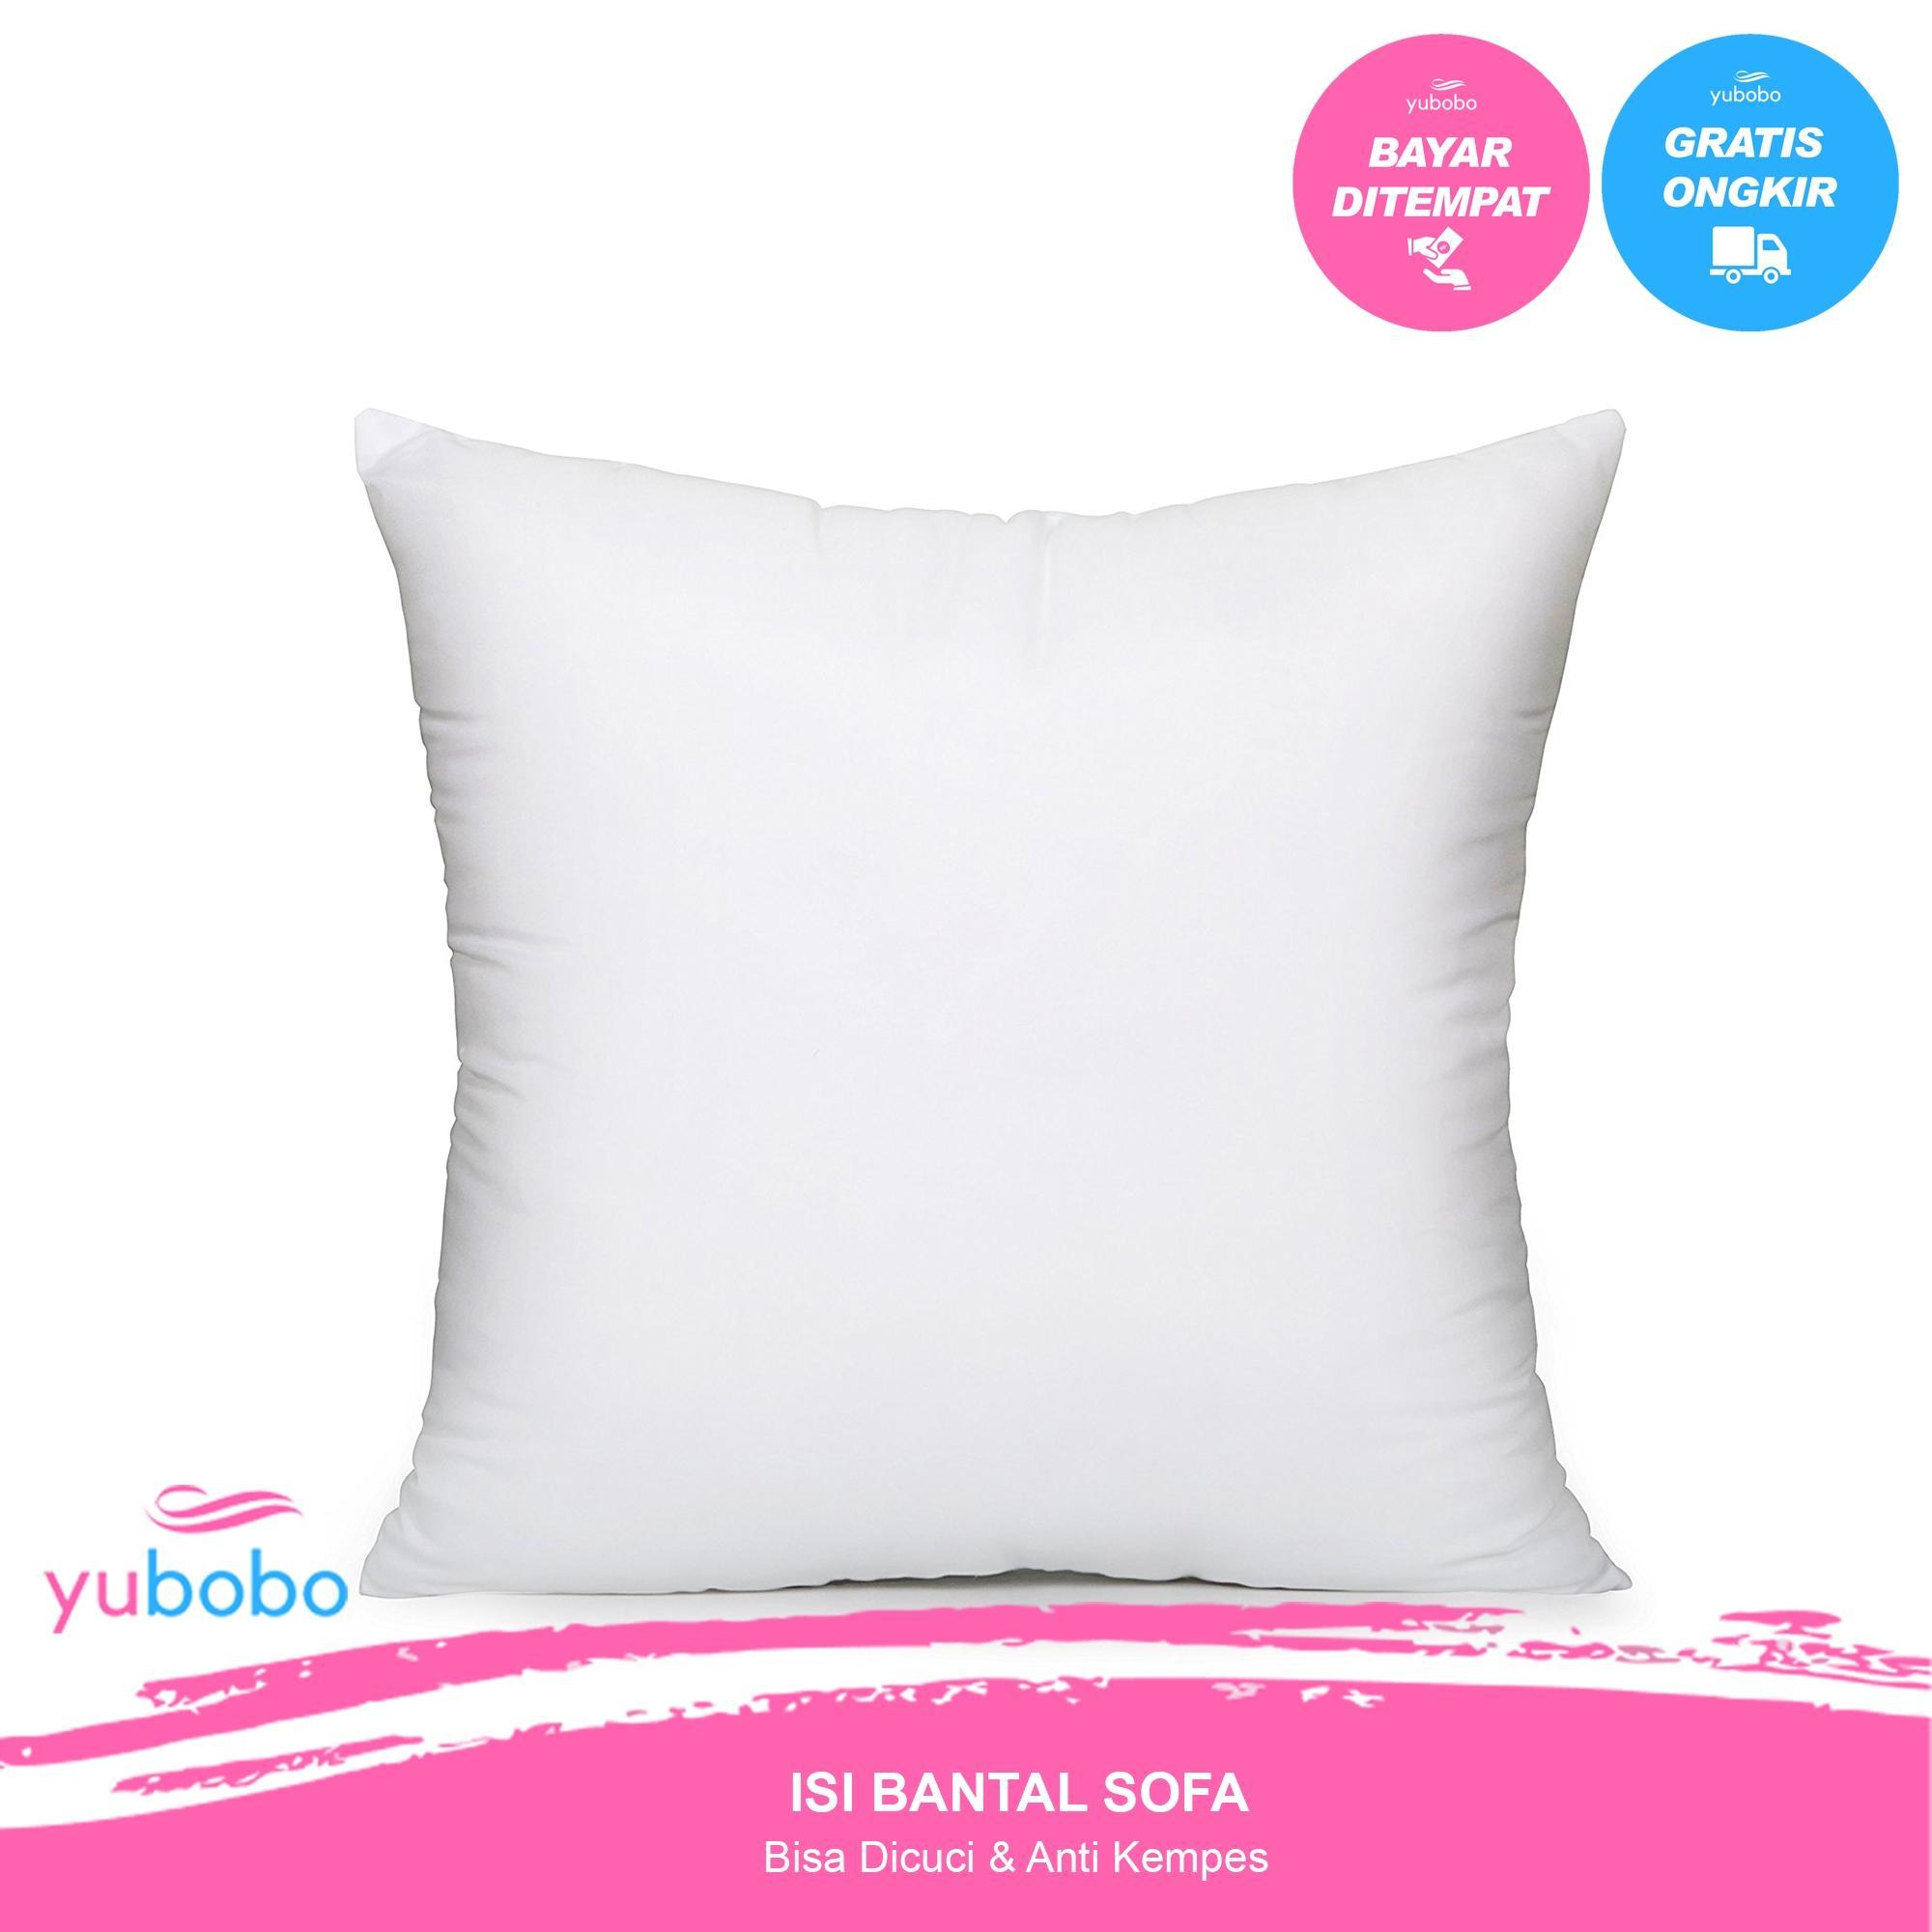 Paket 1 Pcs Promo Isi Bantal Sofa Tamu 40 x 40 cm - Kursi - Bantal Standar Hotel (Hanya Bantal) Polos - Yubobo